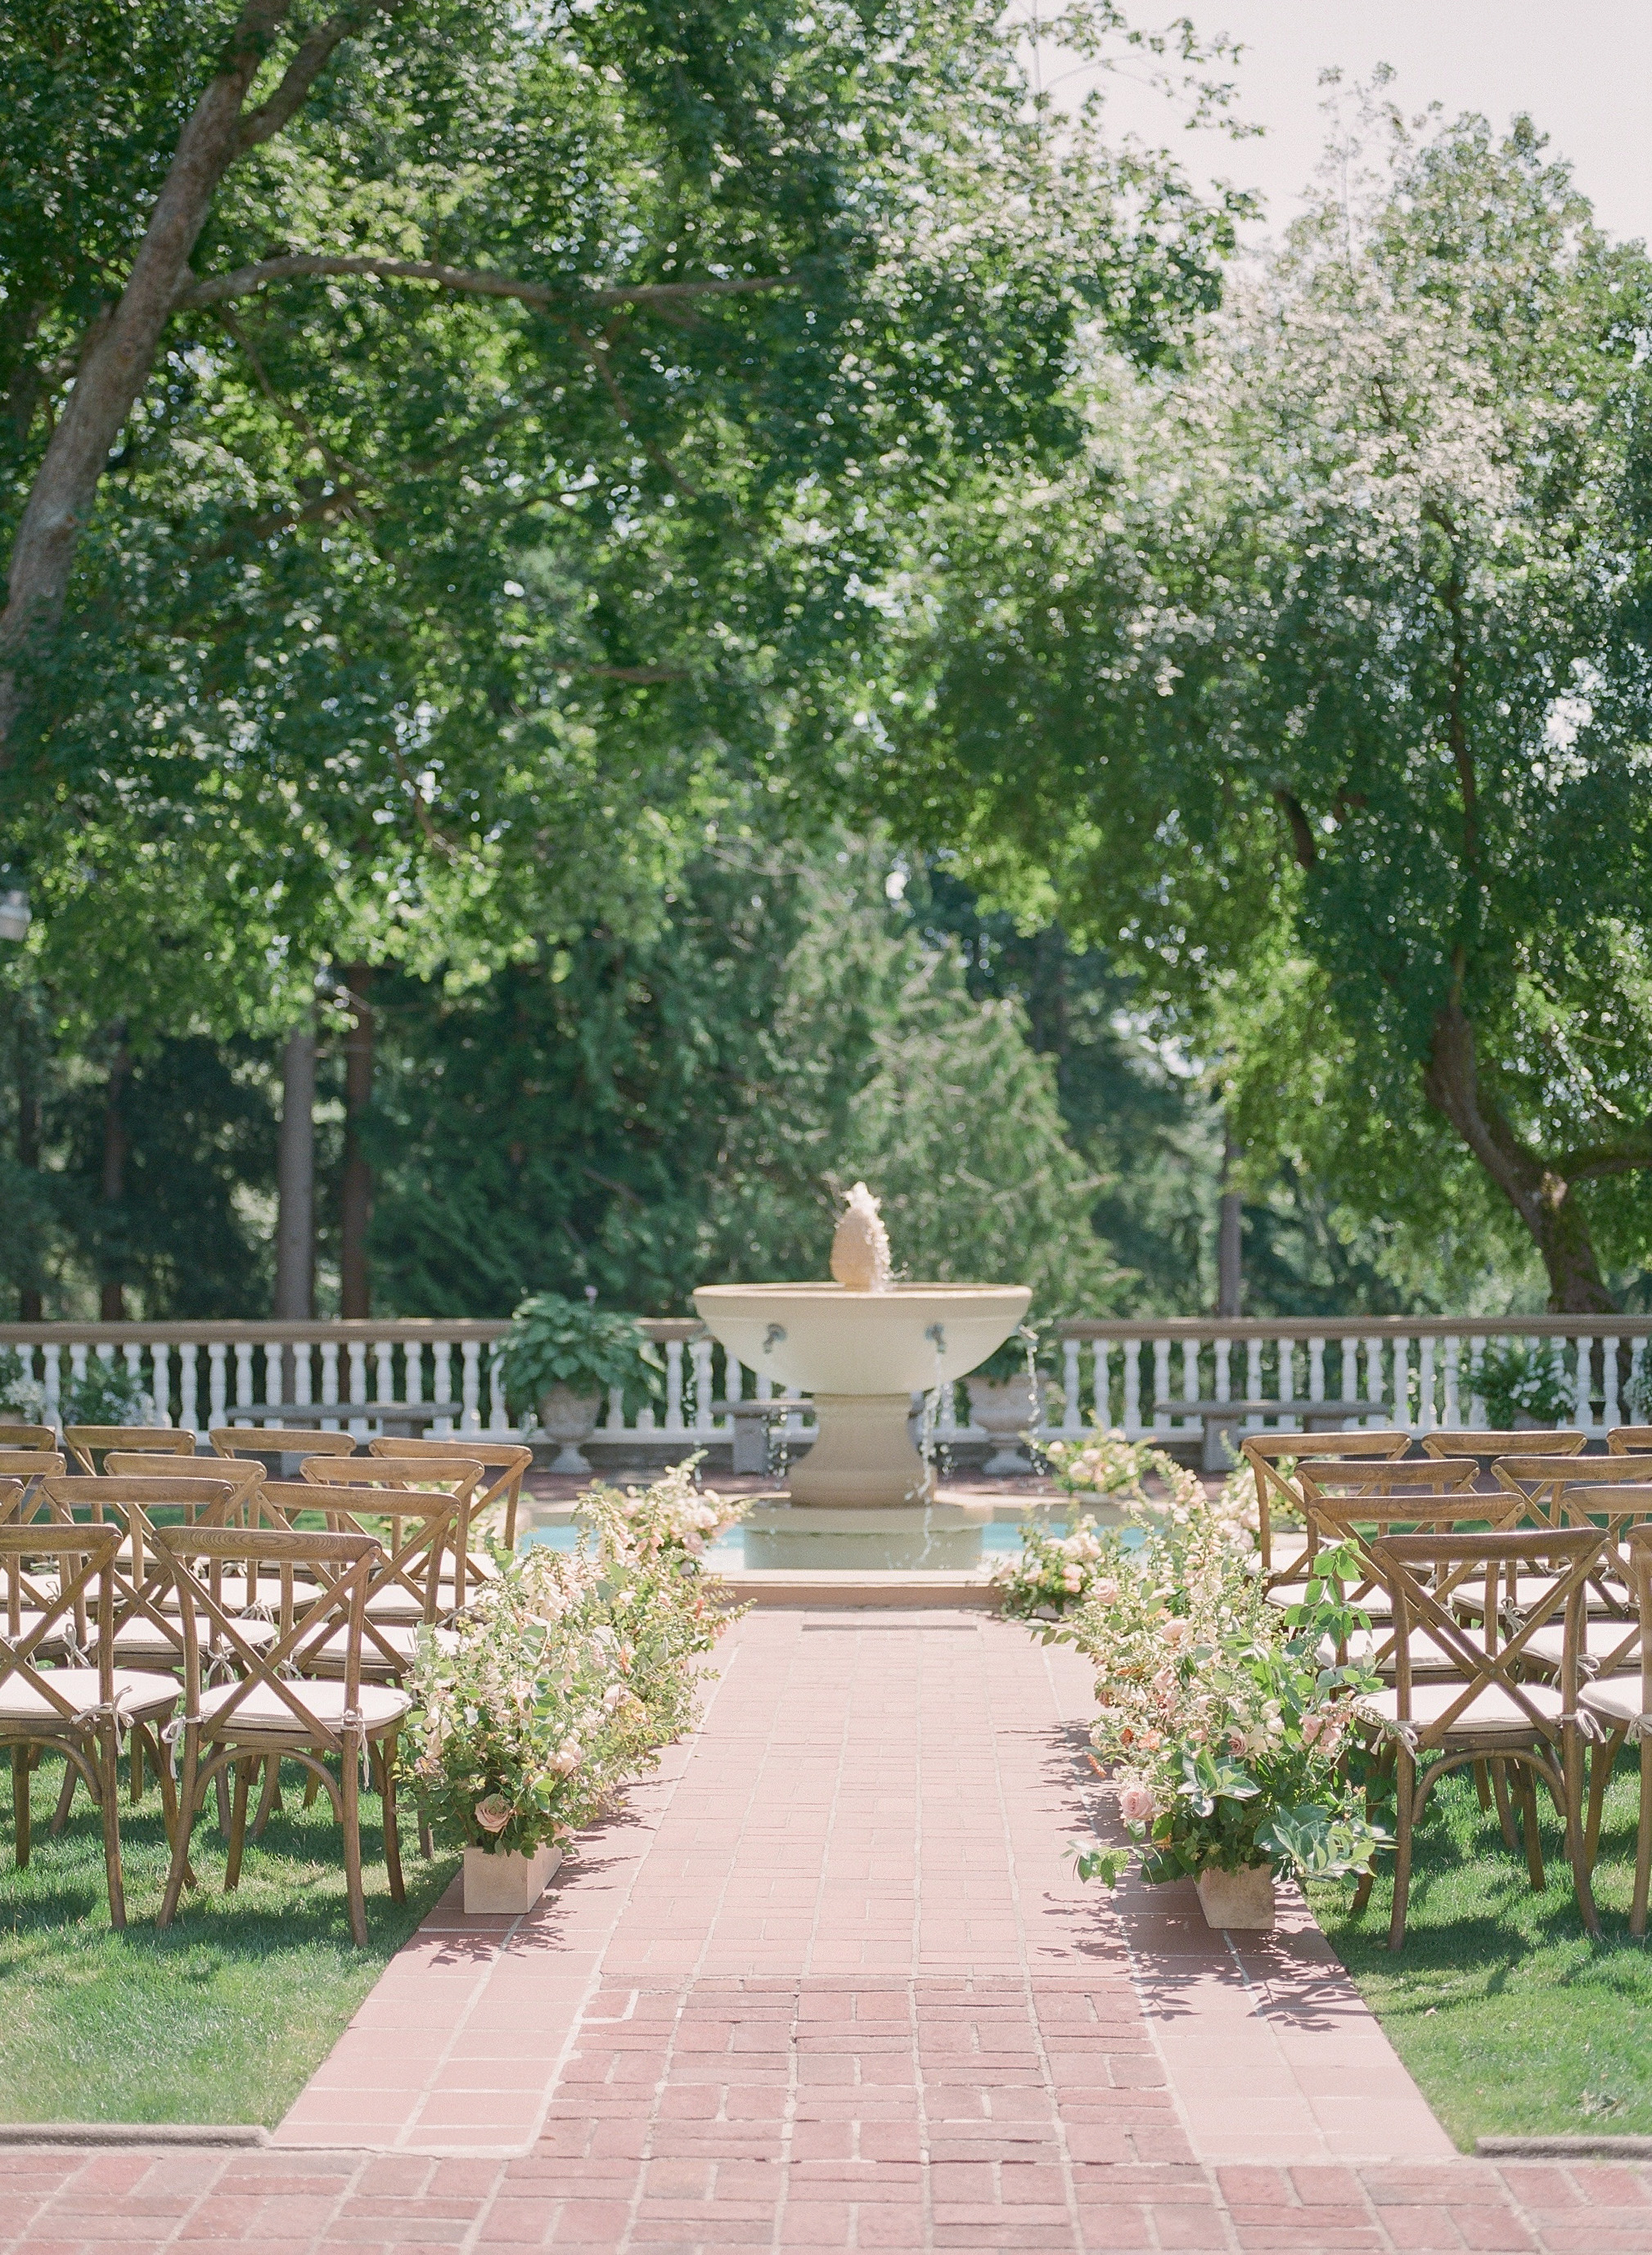 evelyn sam wedding scenic outdoor wedding venue